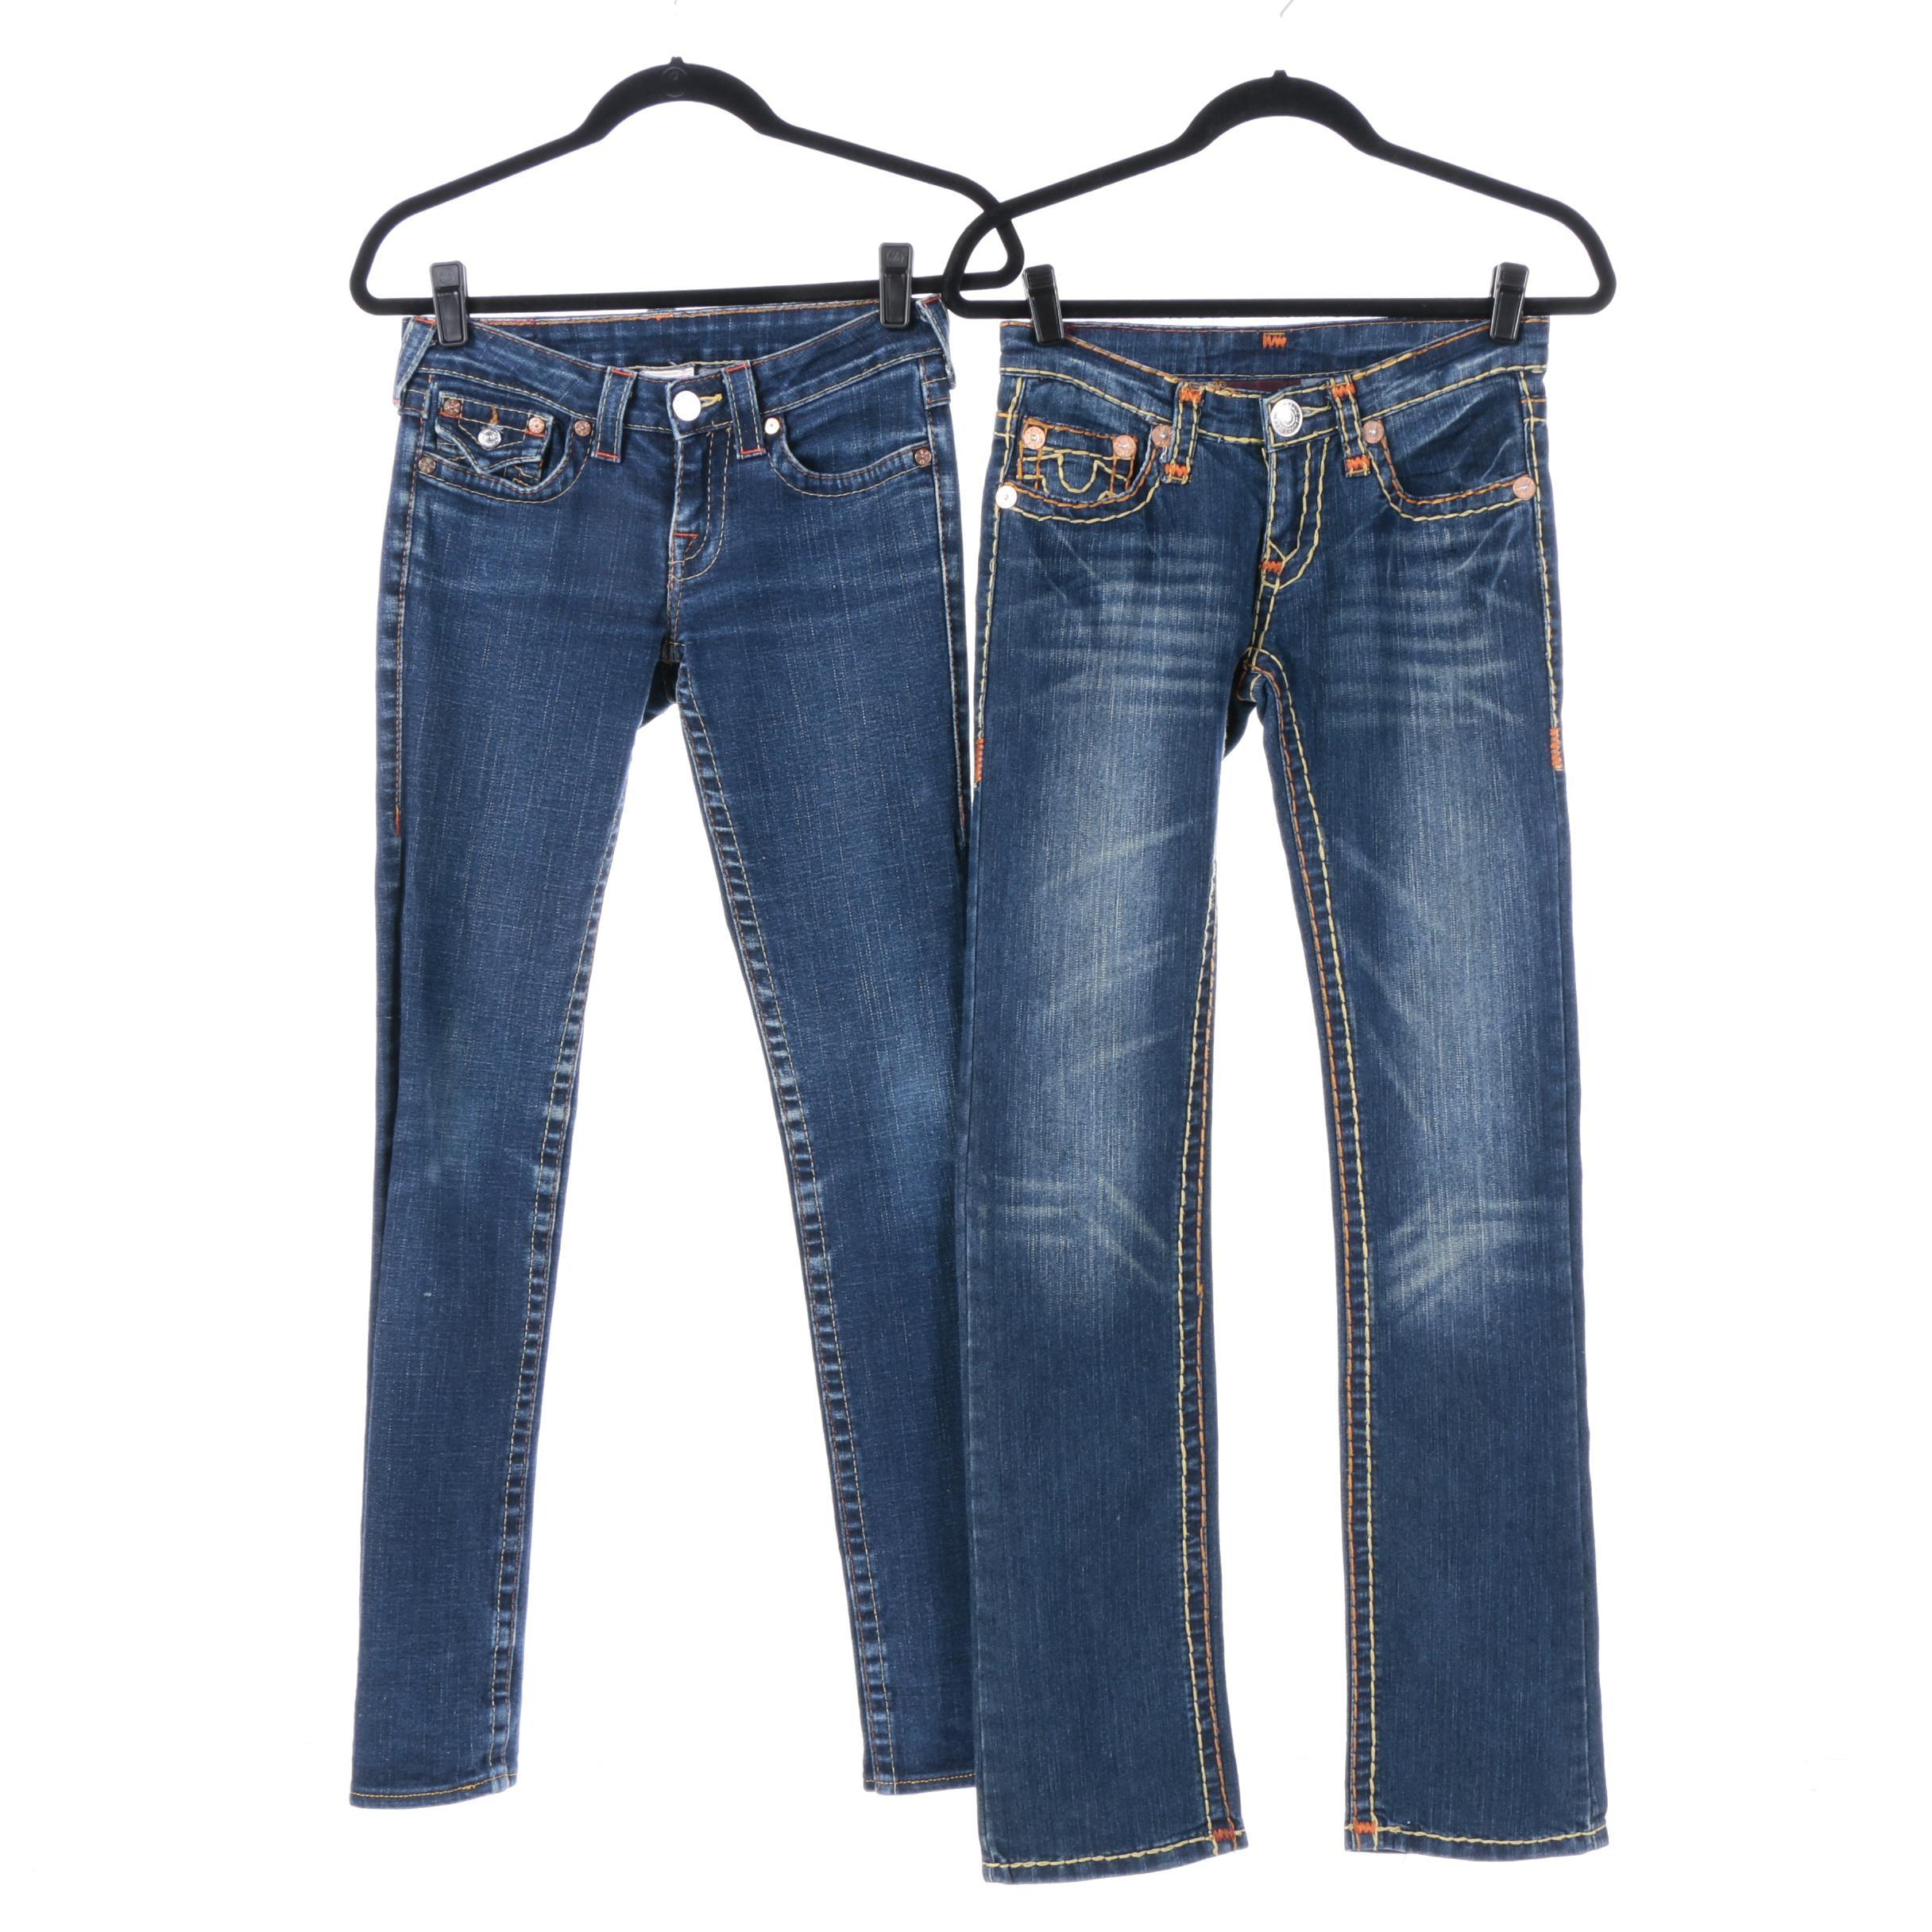 Women's True Religion Brand Jeans